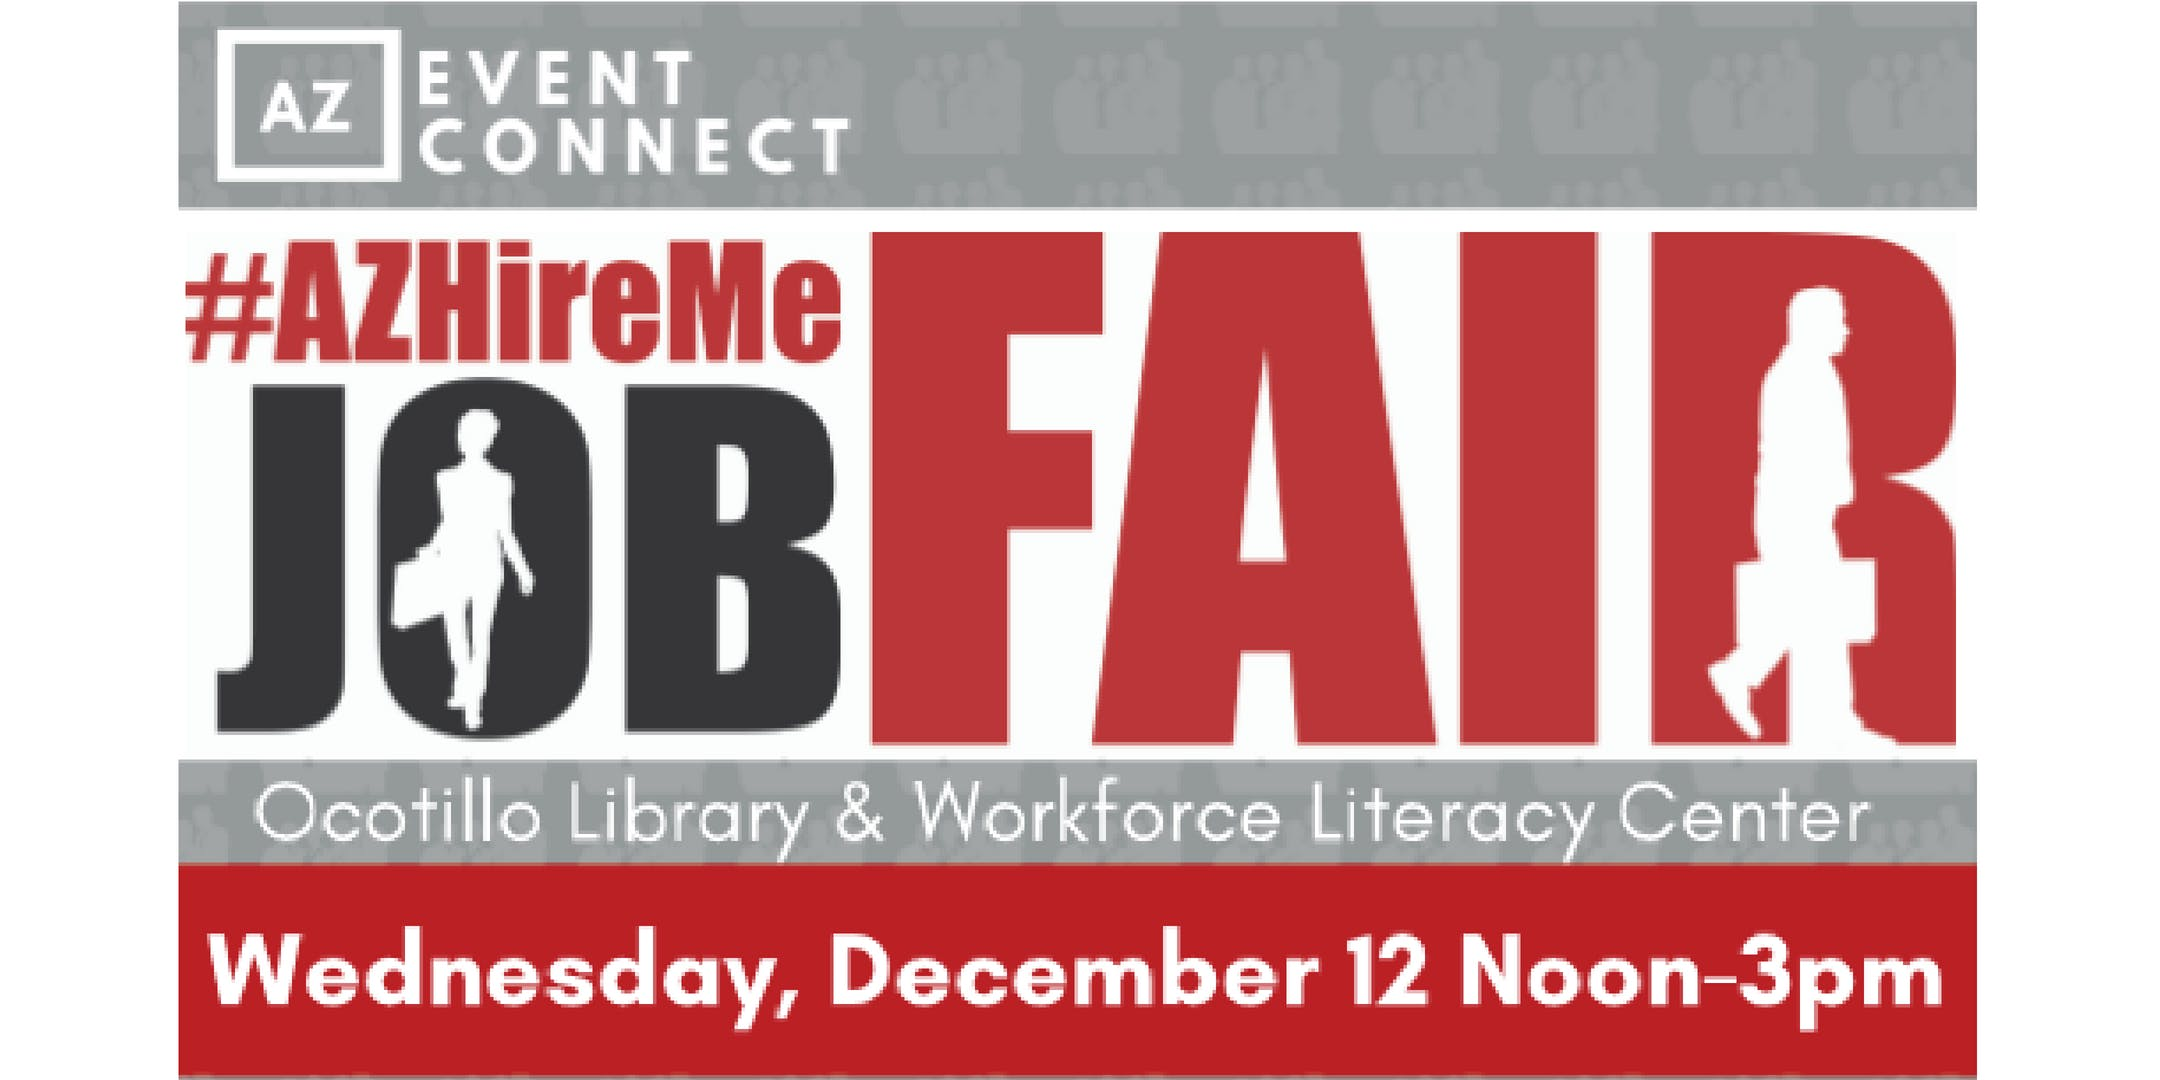 #AZHireMe Job Fair| Meet in person with hiring companies| December 12, 2018